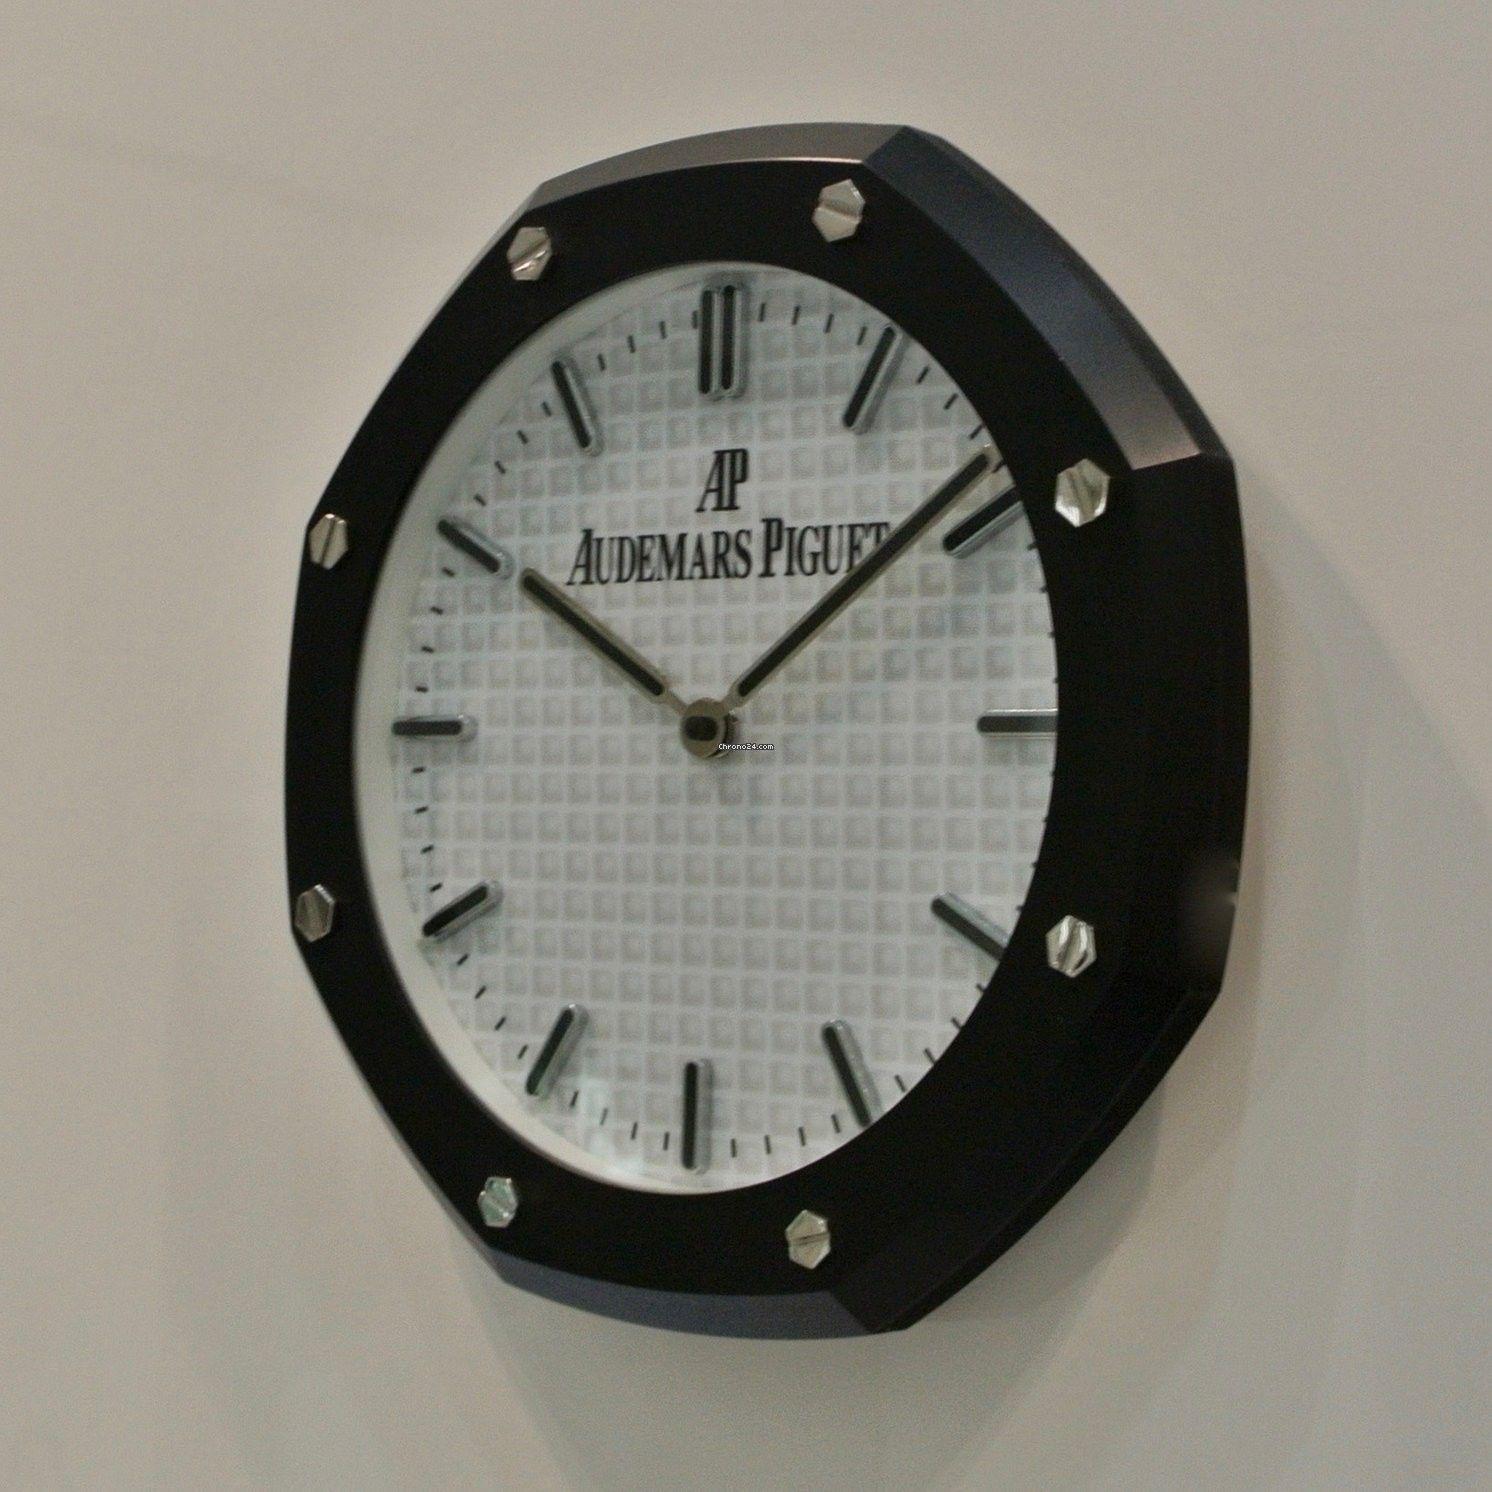 Audemars Piguet Original Wall Clock Rare Black Model